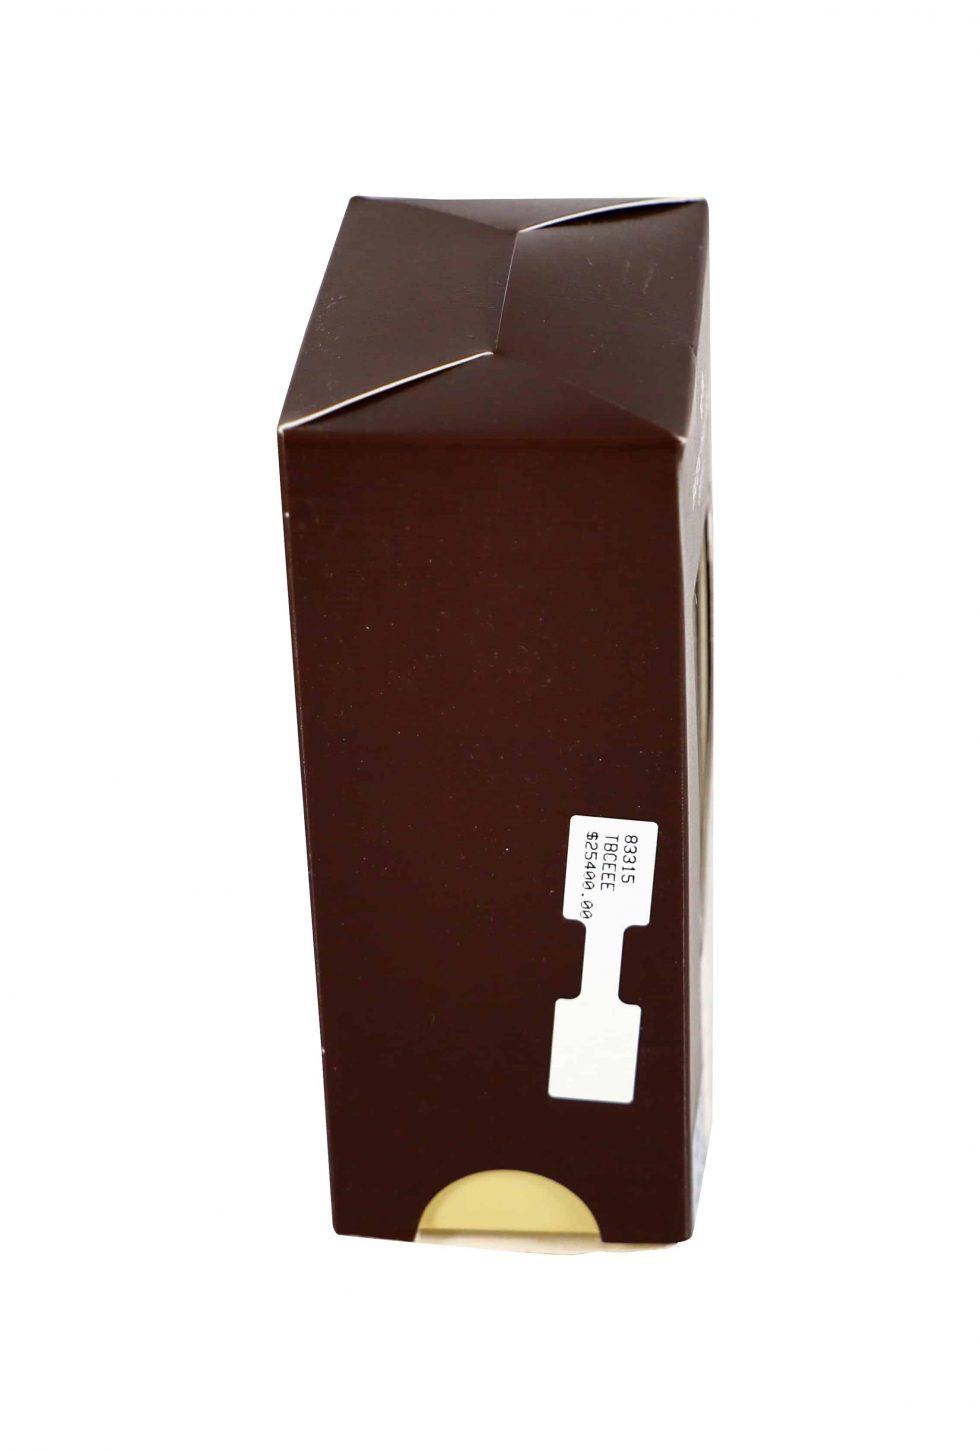 Lot #6811 – Patek Philippe Nautilus Steel 5711-1A-010 Watch Box Omega [tag]